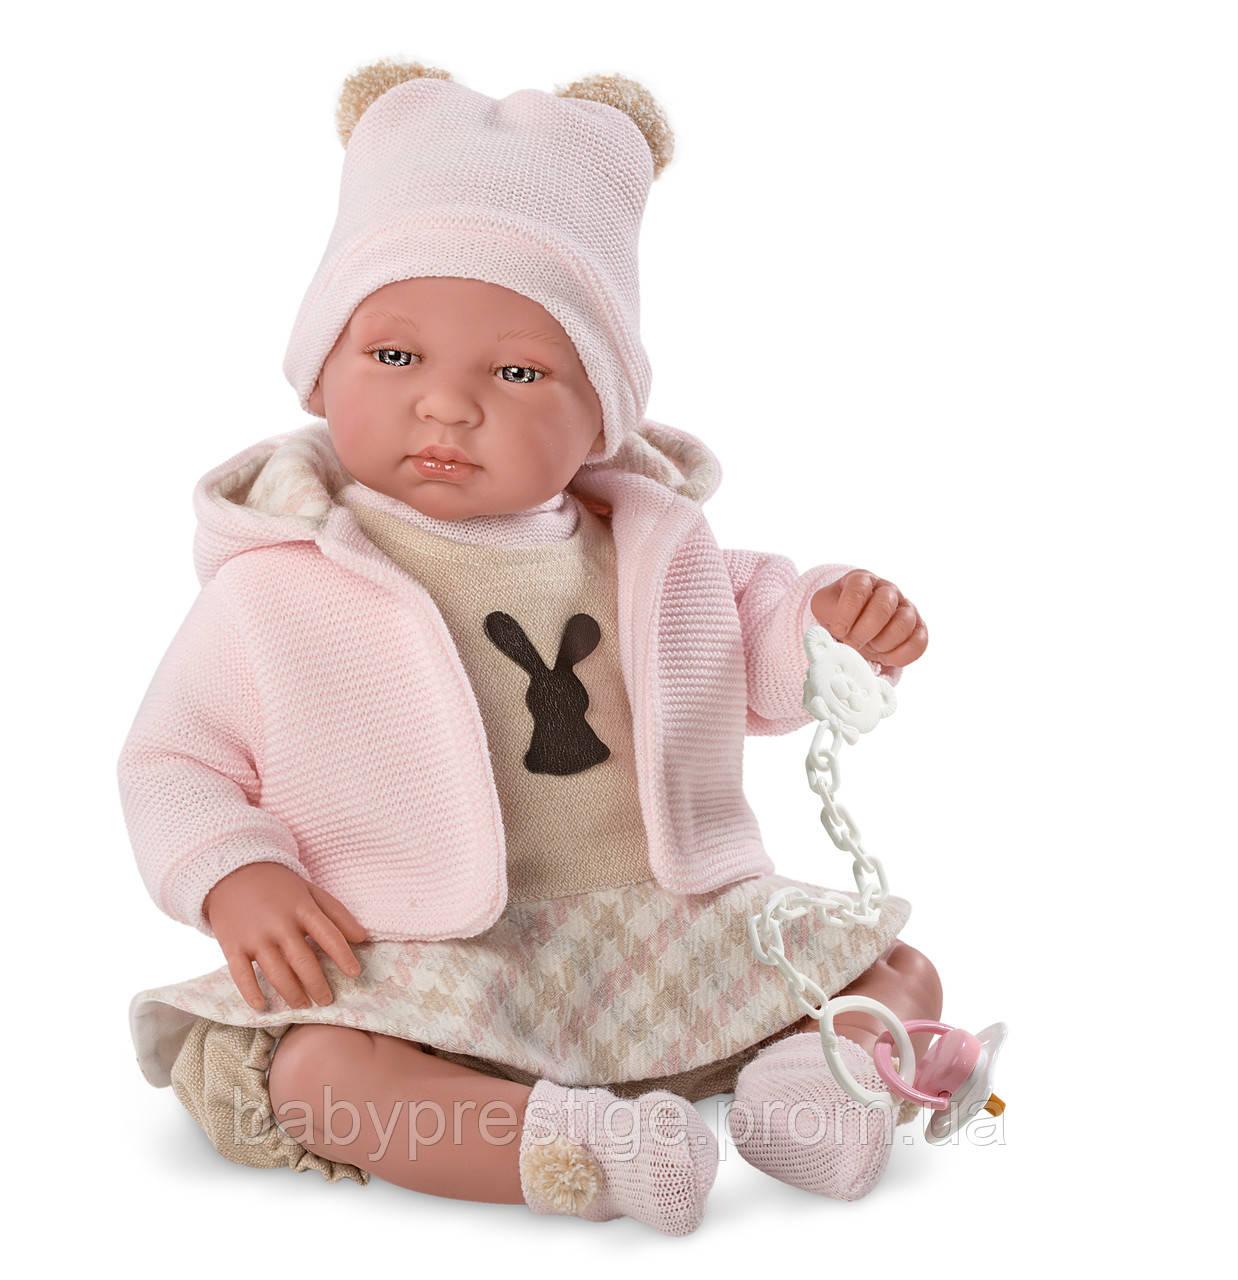 Llorens - кукла младенец девочка Recien Nacido, 44 см